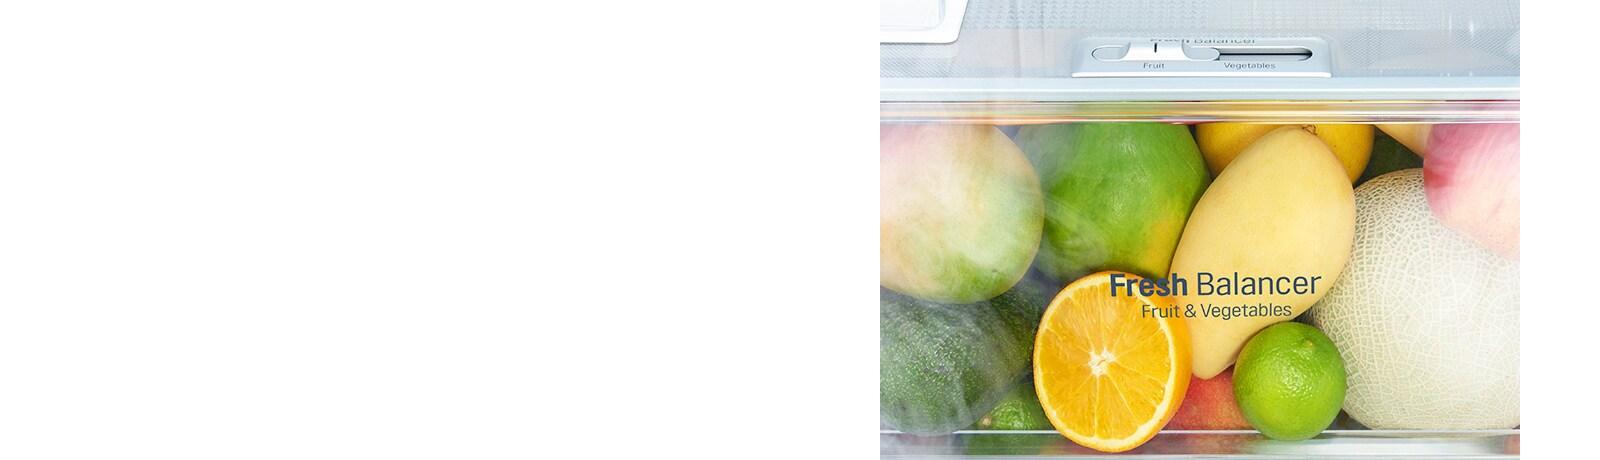 P-Veyron6-Refresh-InstaView-MatteBlackST-Nplumbing-11-Balancer-D